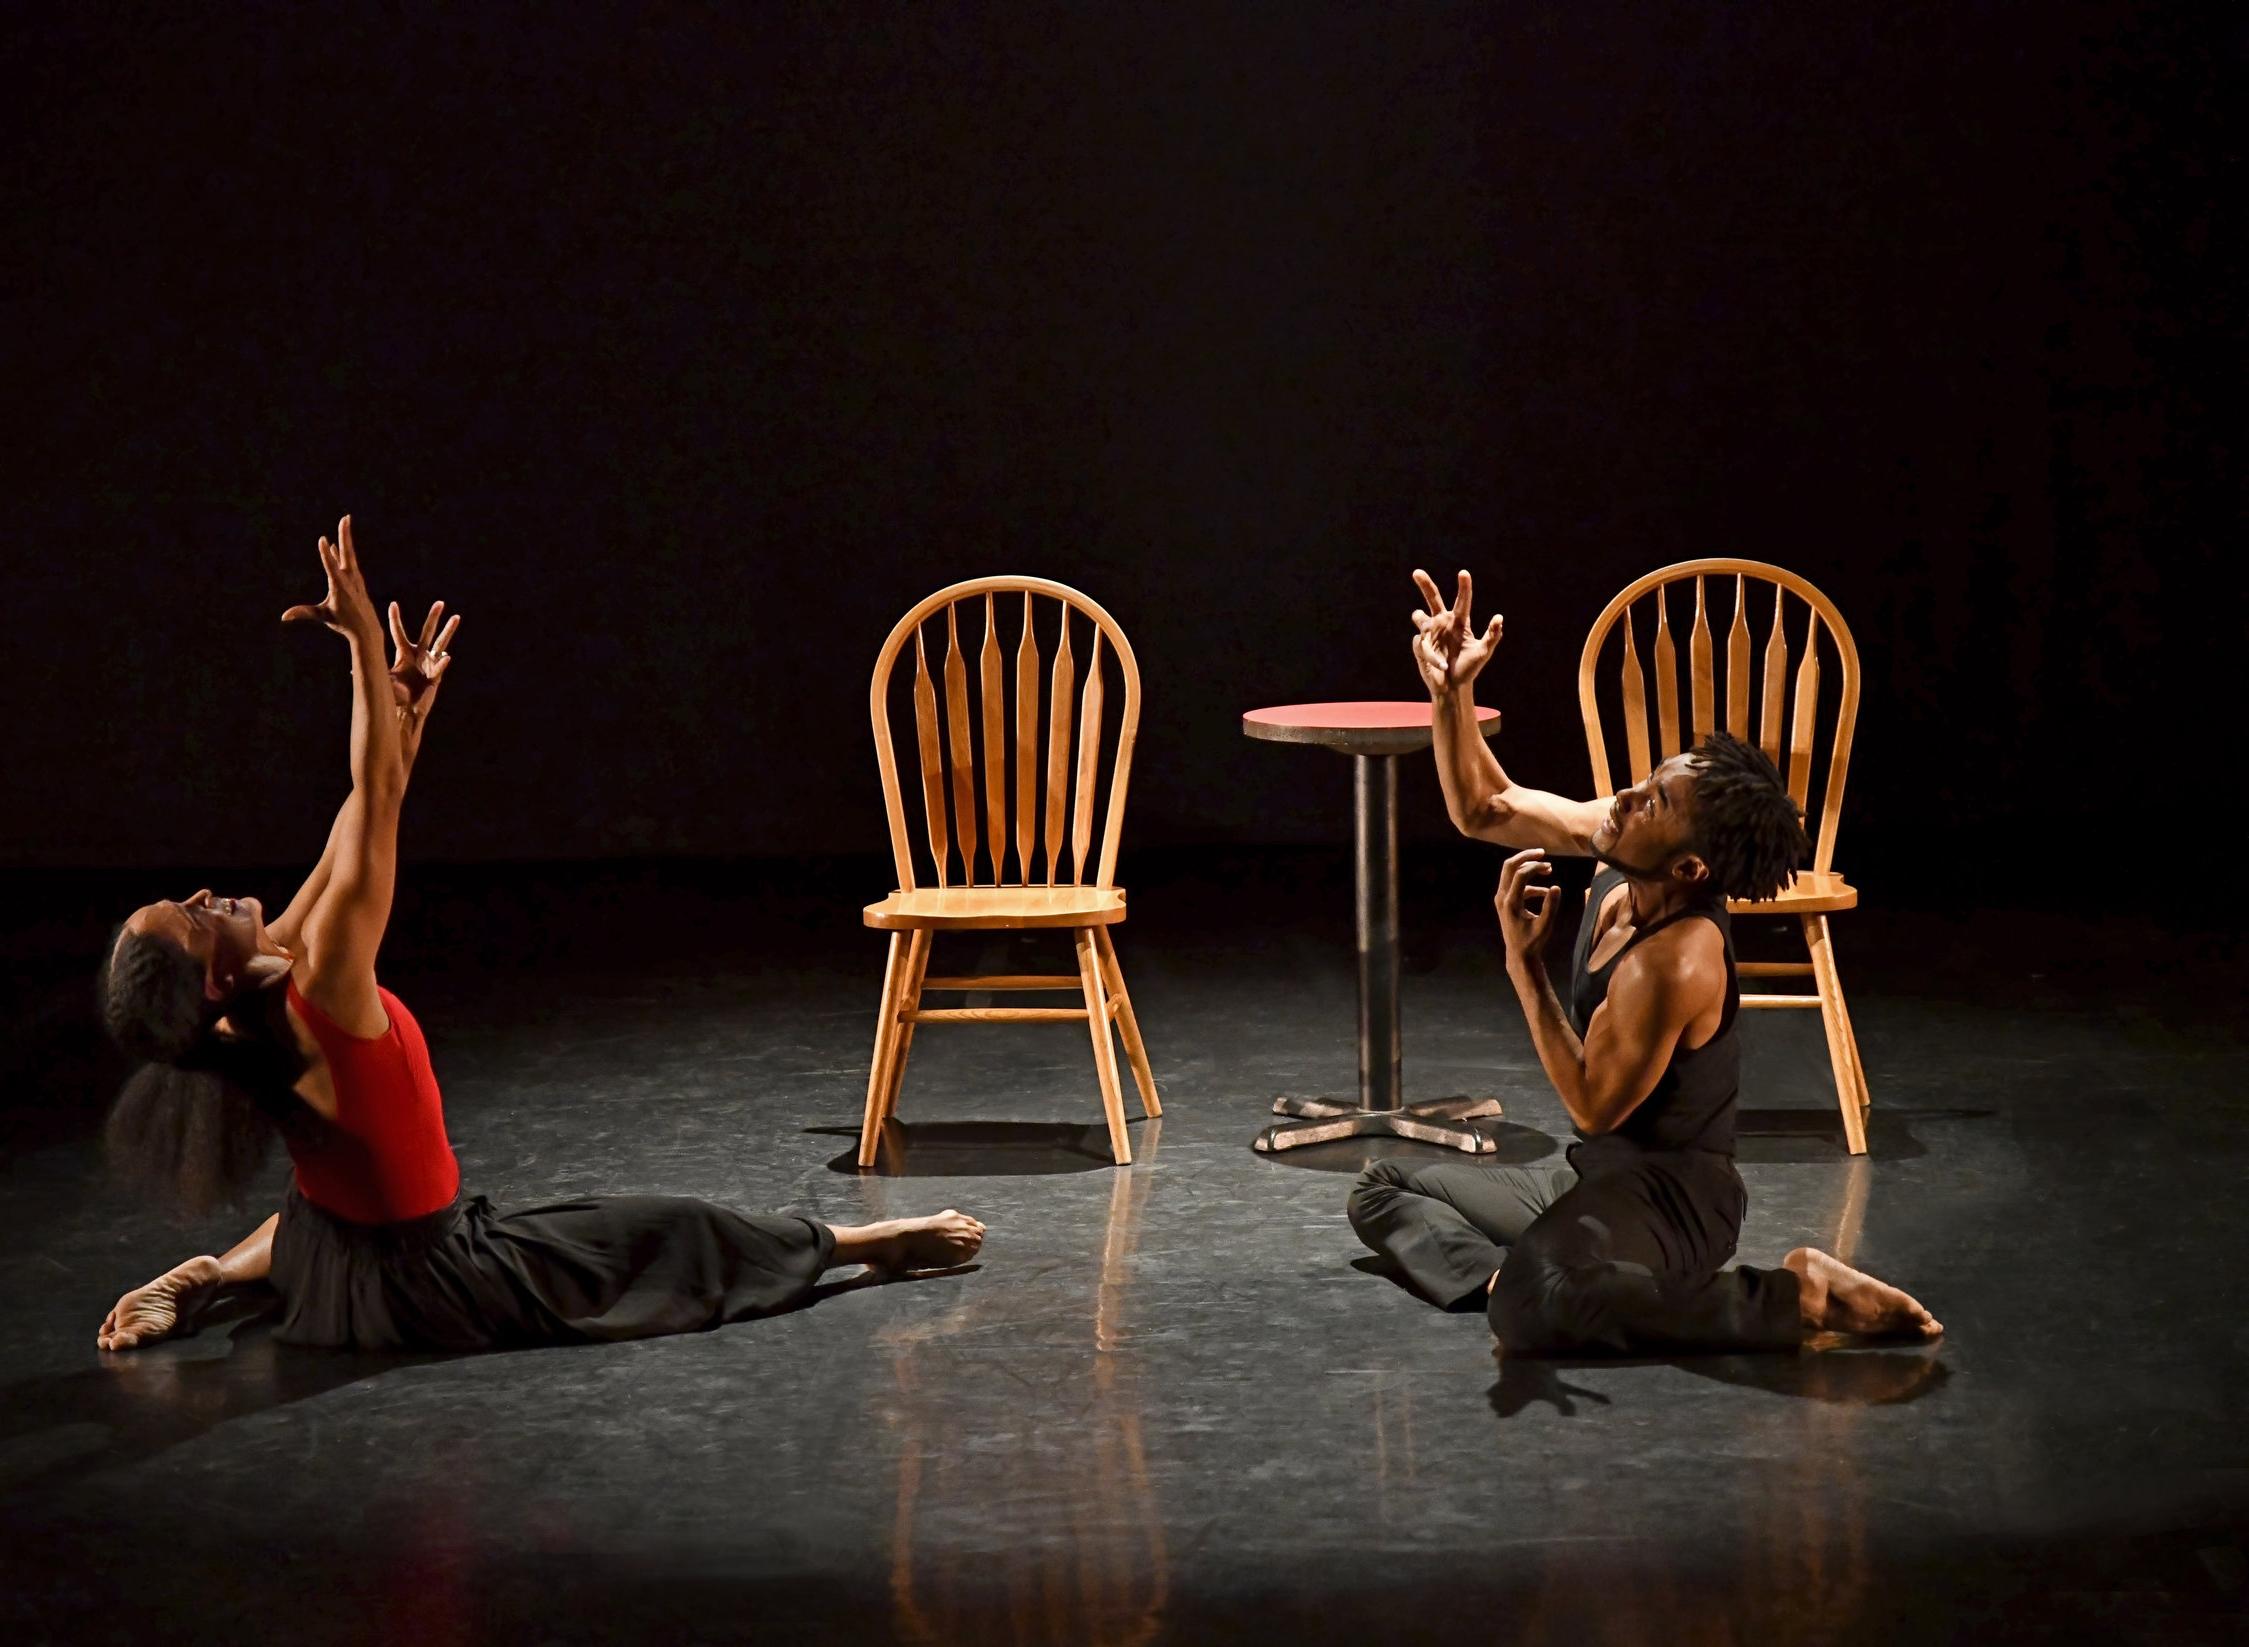 Love's Liberation - Choreographers: Bashir & Christopher Page-SandersMusical Score: Maya Angelou, Leon Bridges, George Winston